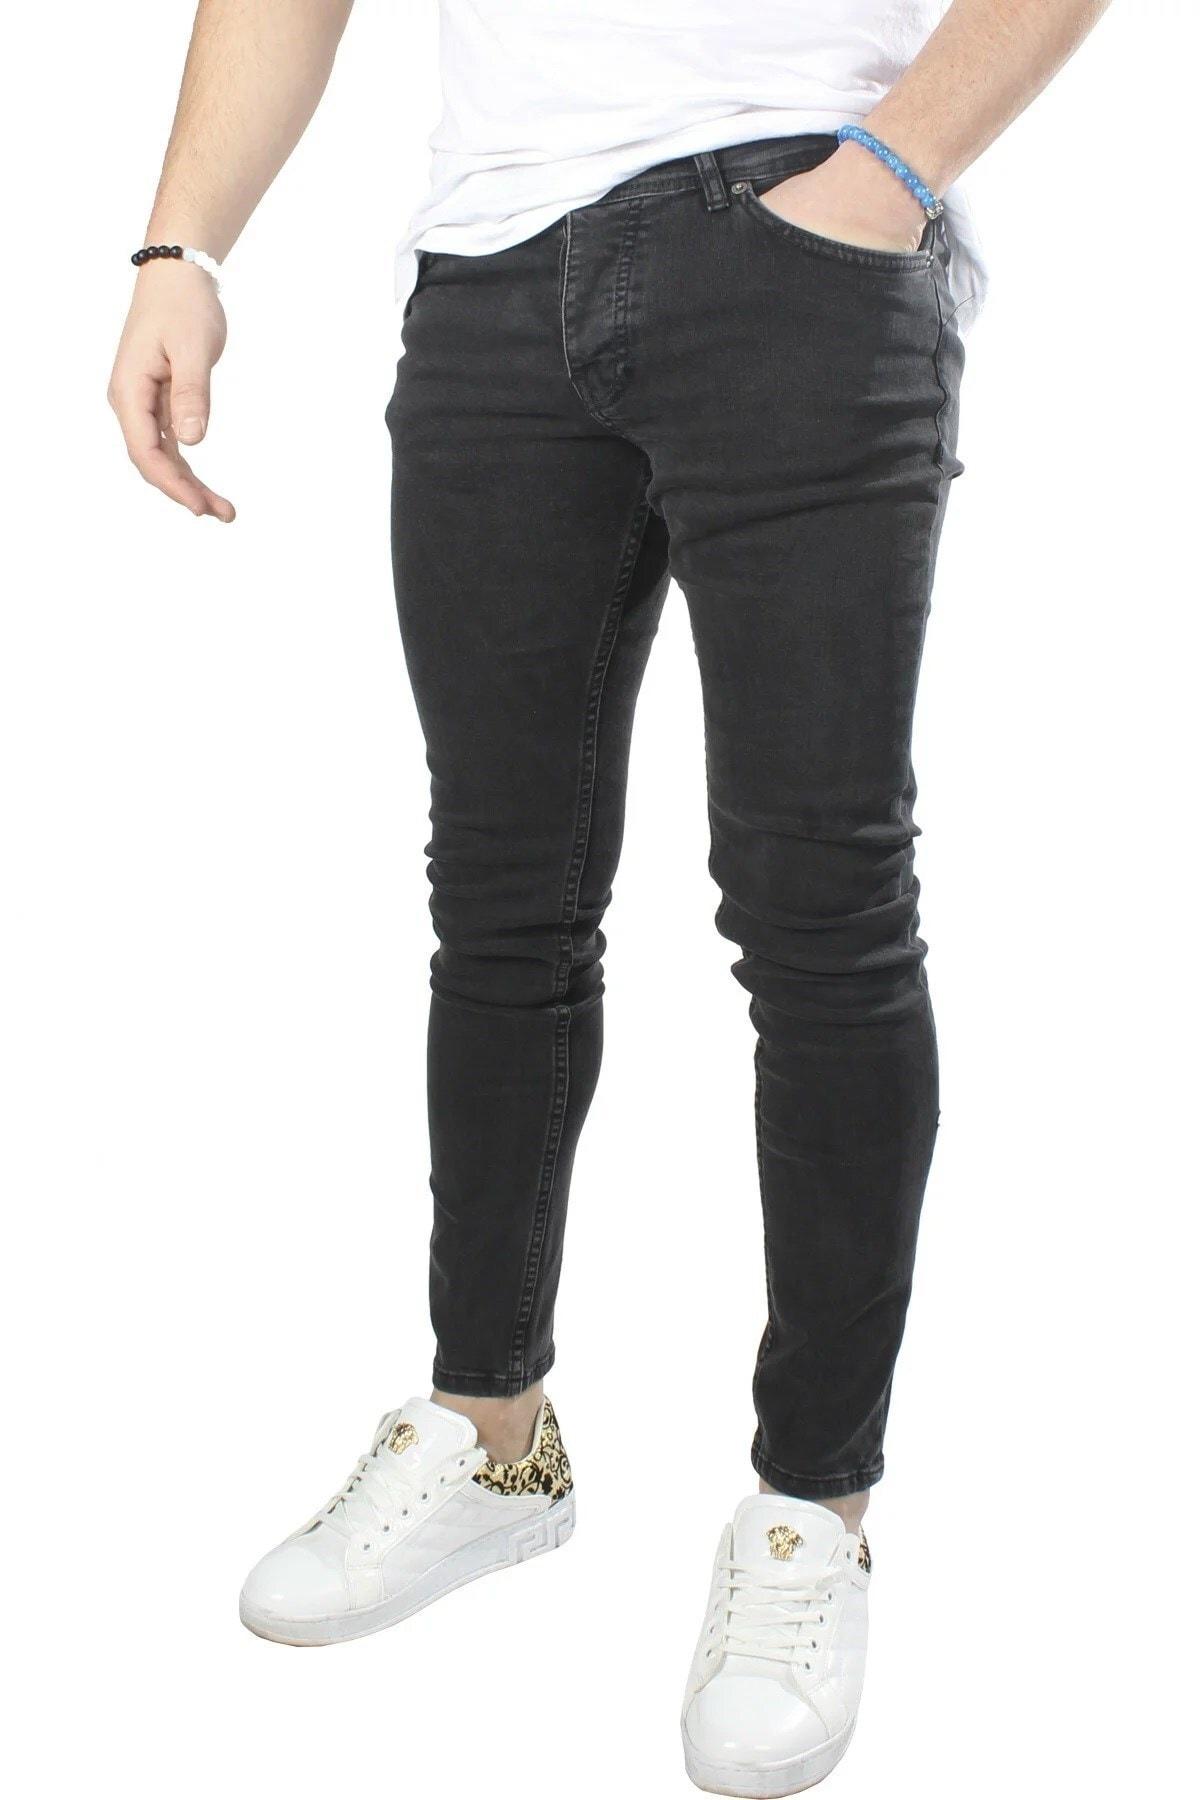 Terapi Men Erkek Kot Pantolon 9K-2100317-008 Füme